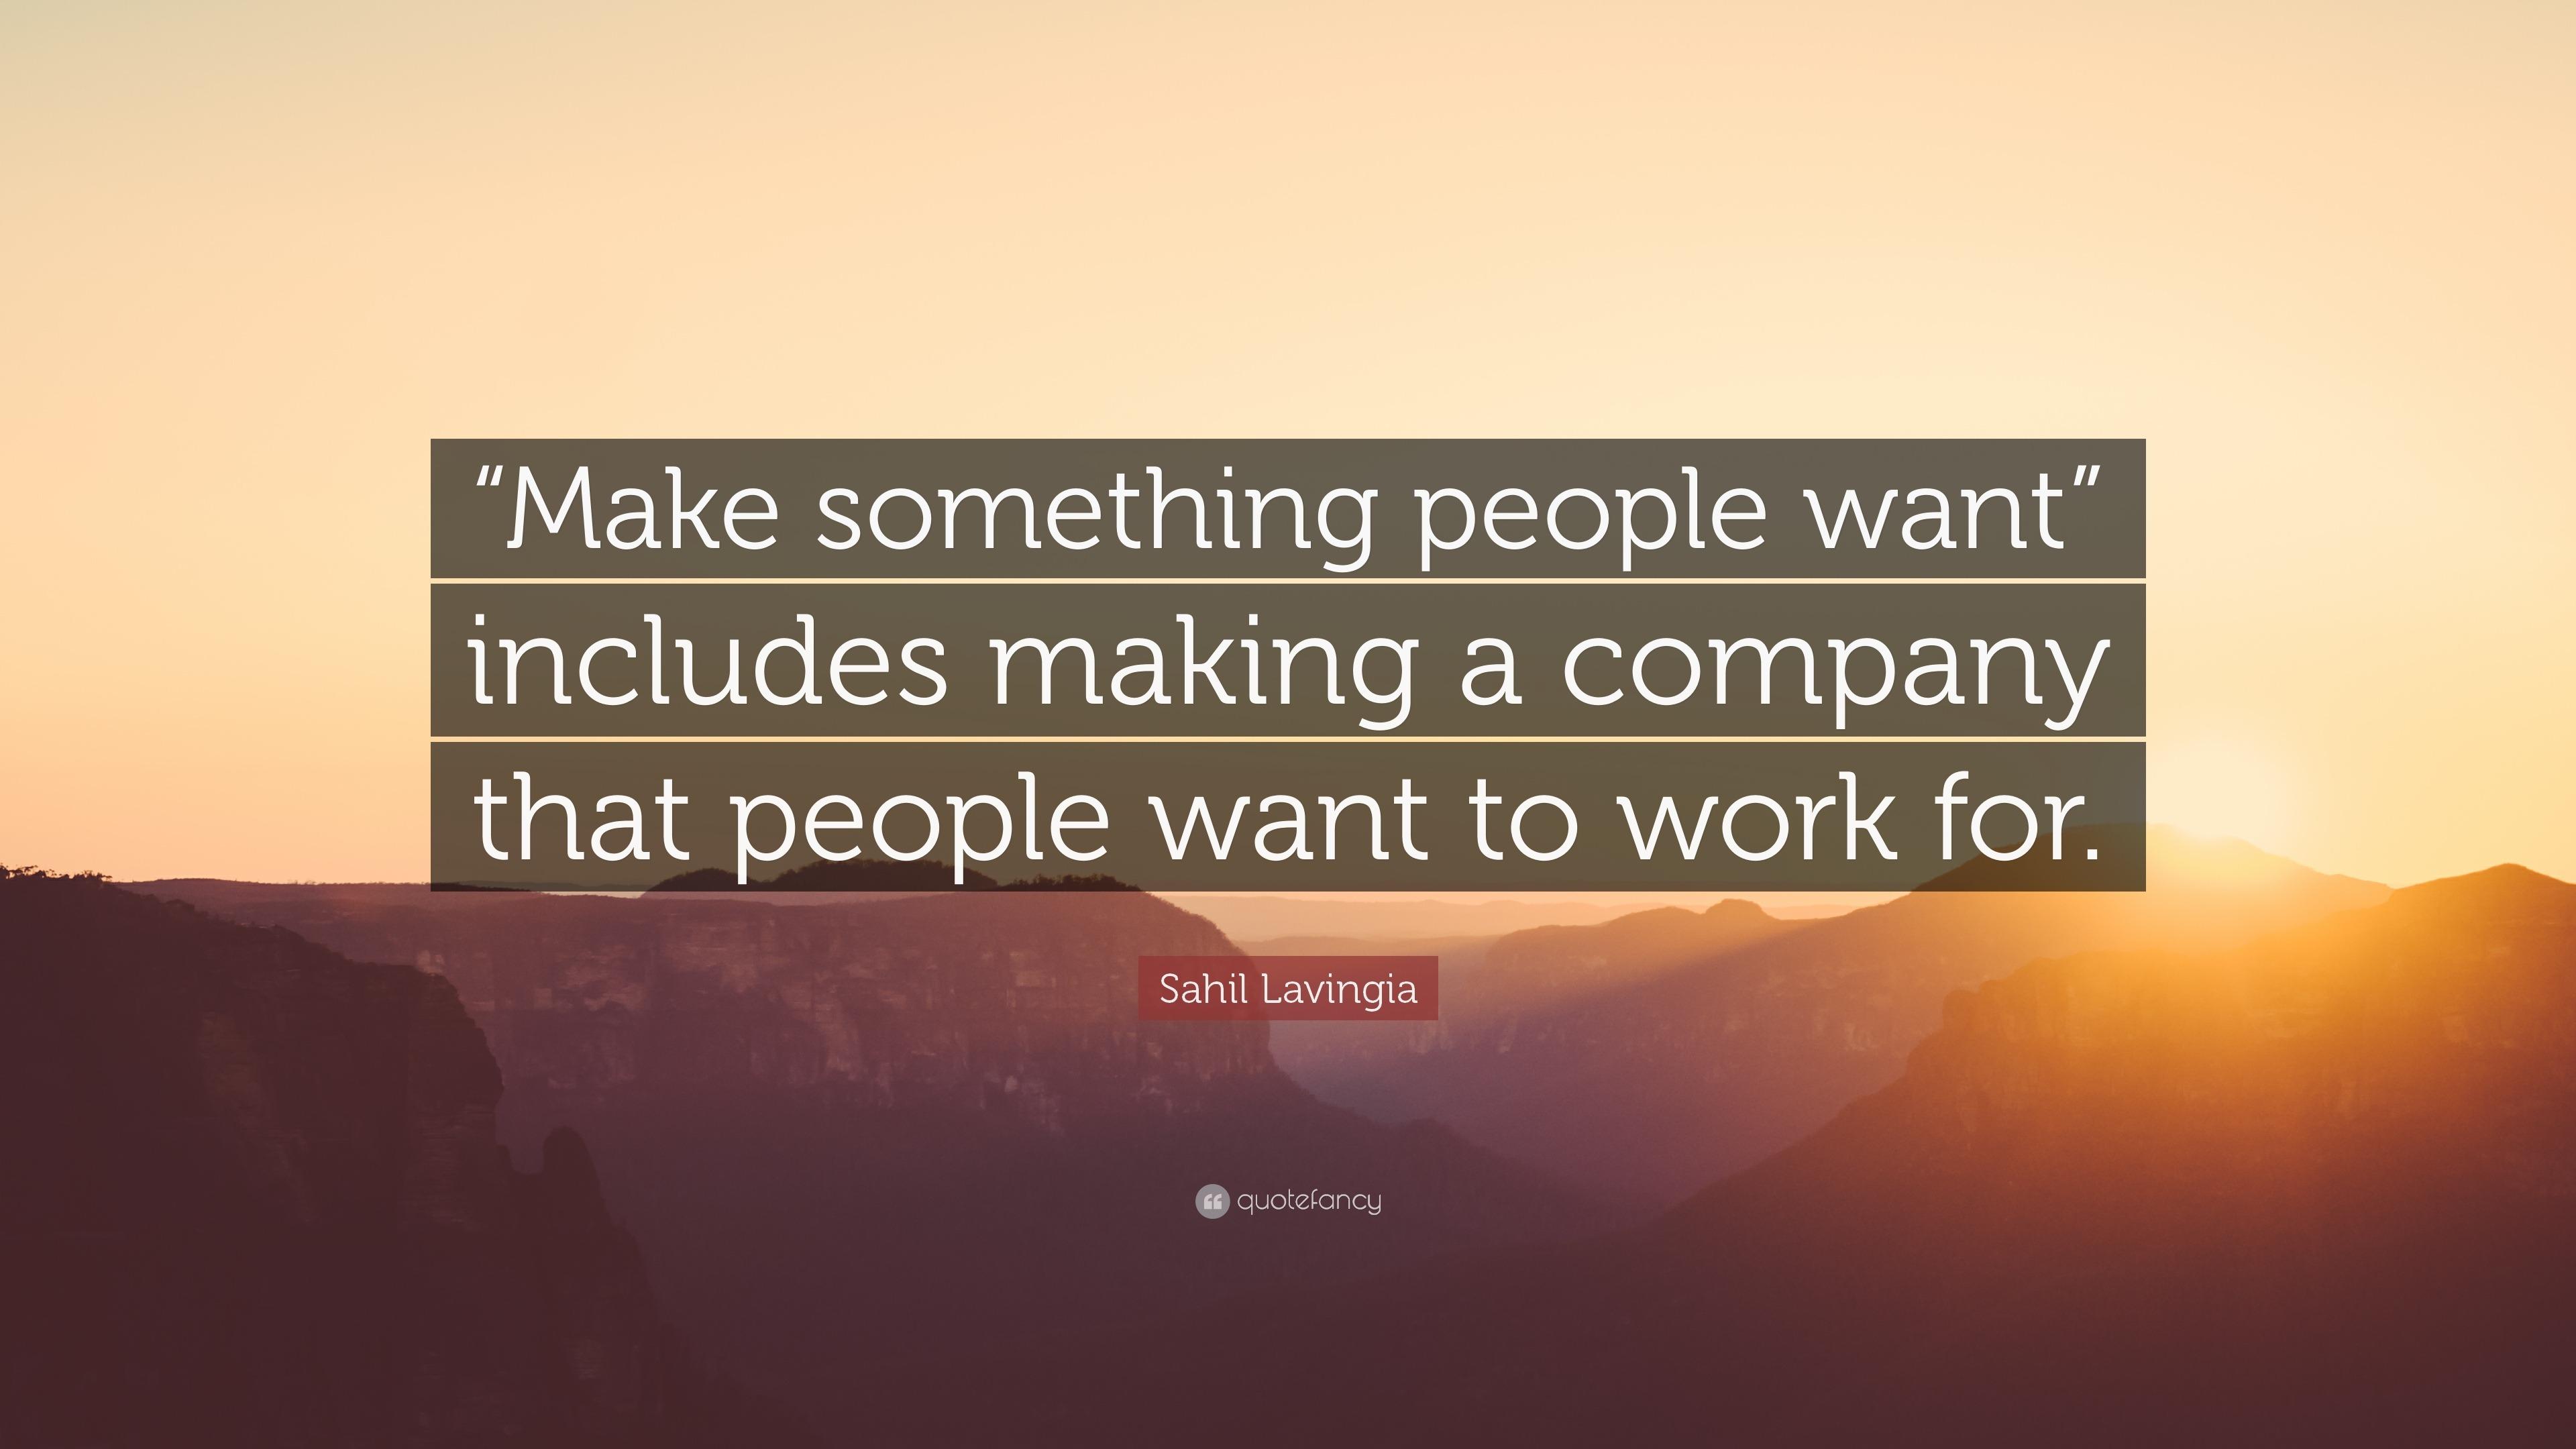 sahil lavingia quote make something people want includes sahil lavingia quote make something people want includes making a company that